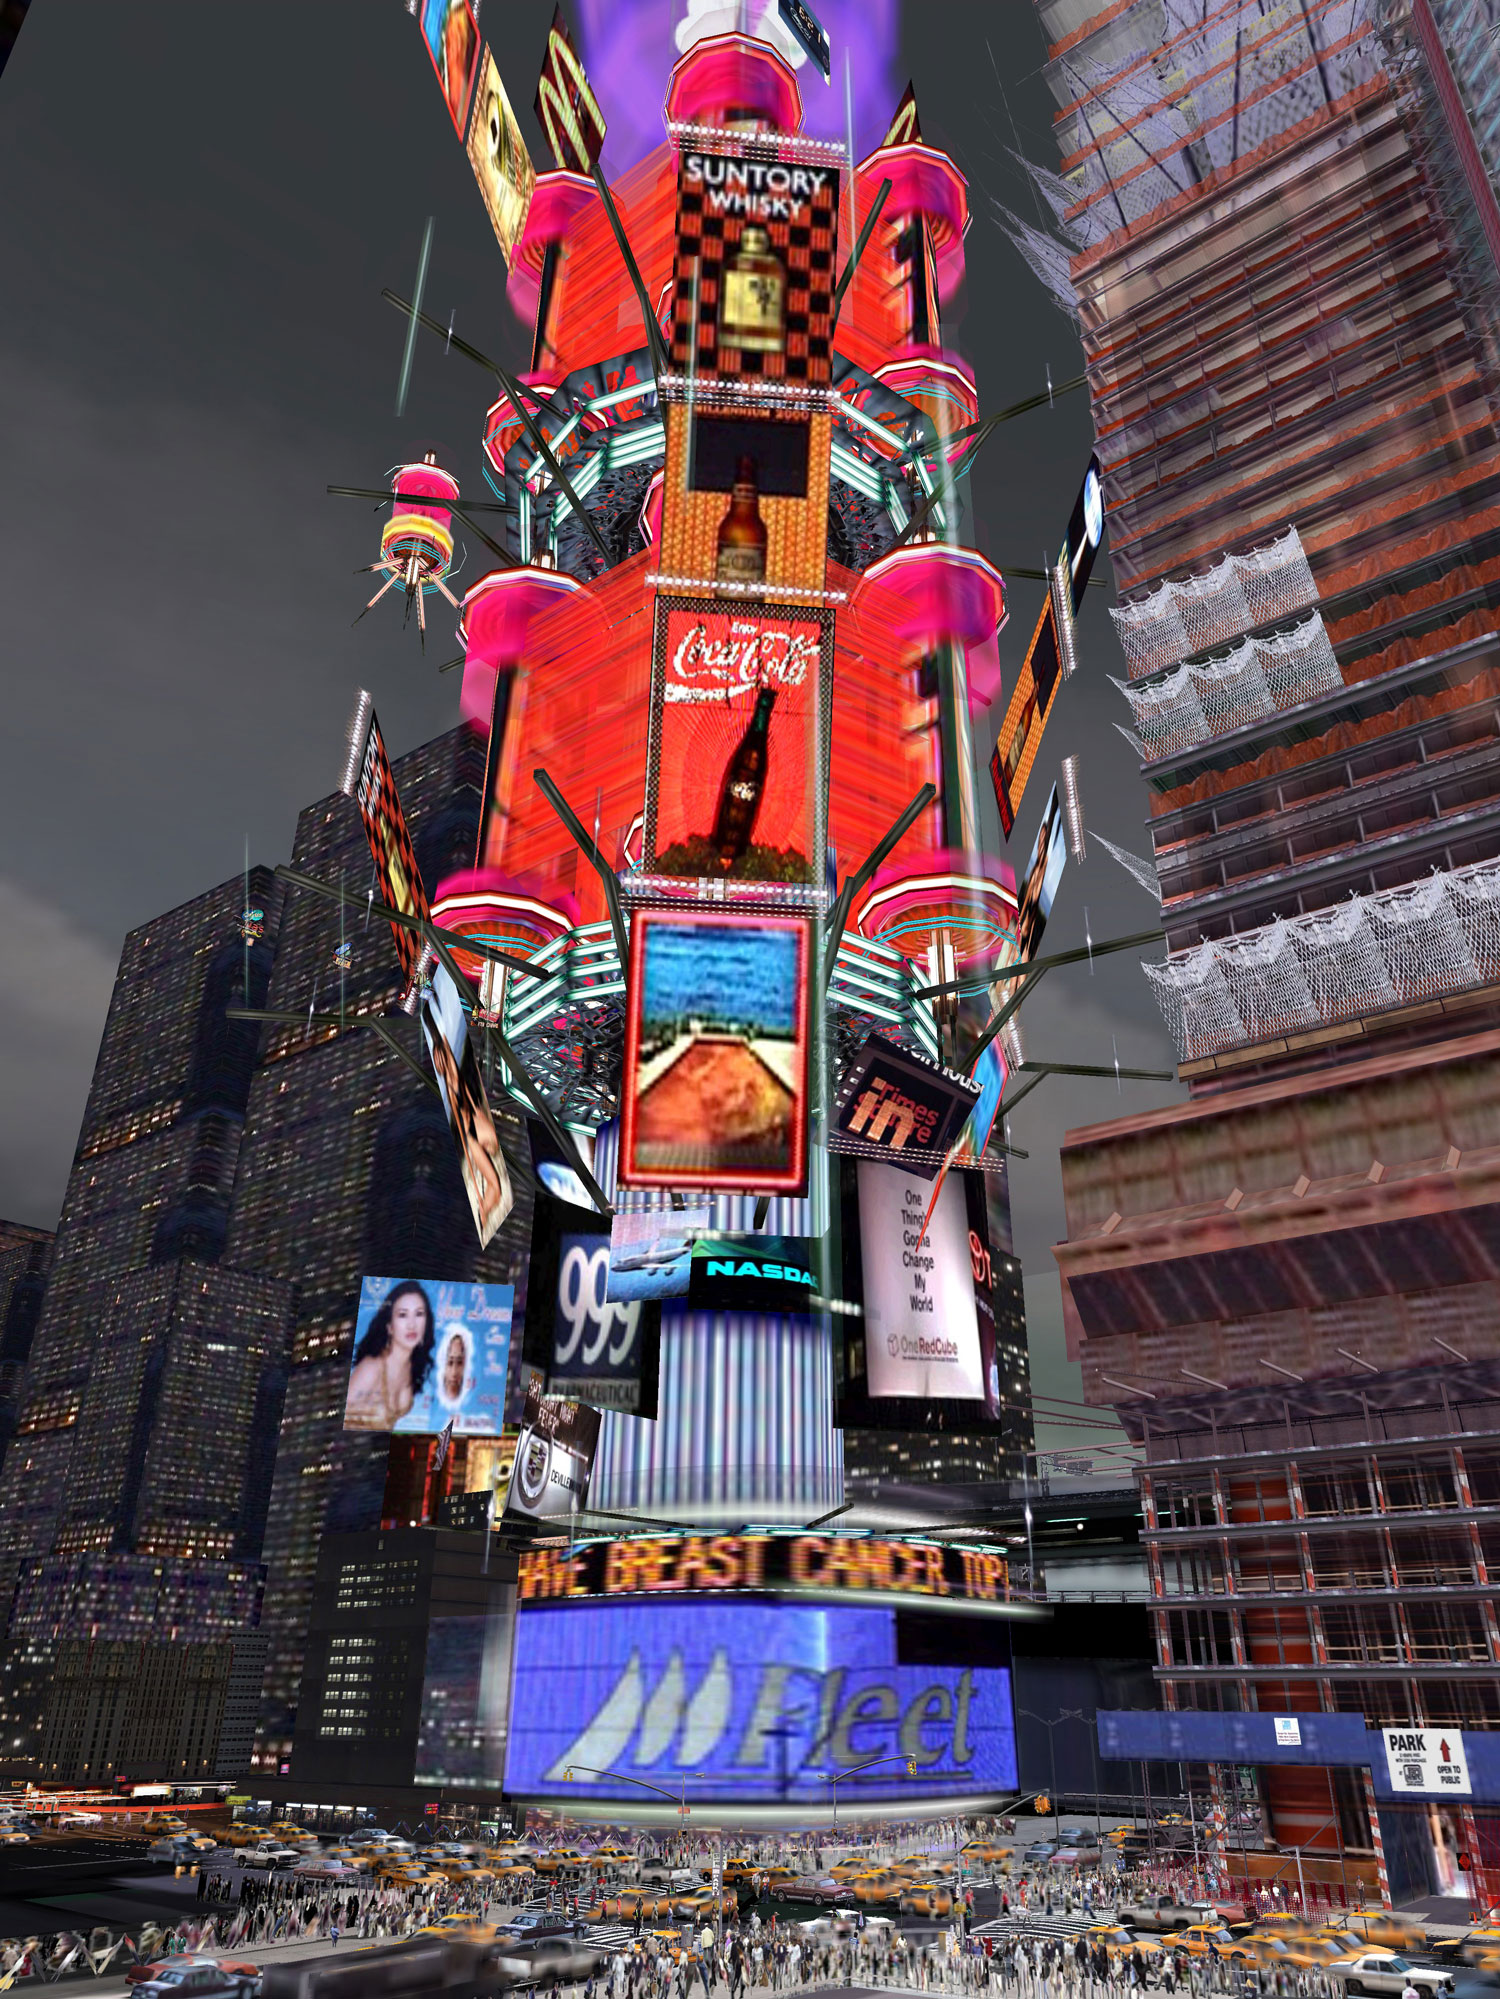 Big Red Lamp (New York Exit New York© Series, No. 7)